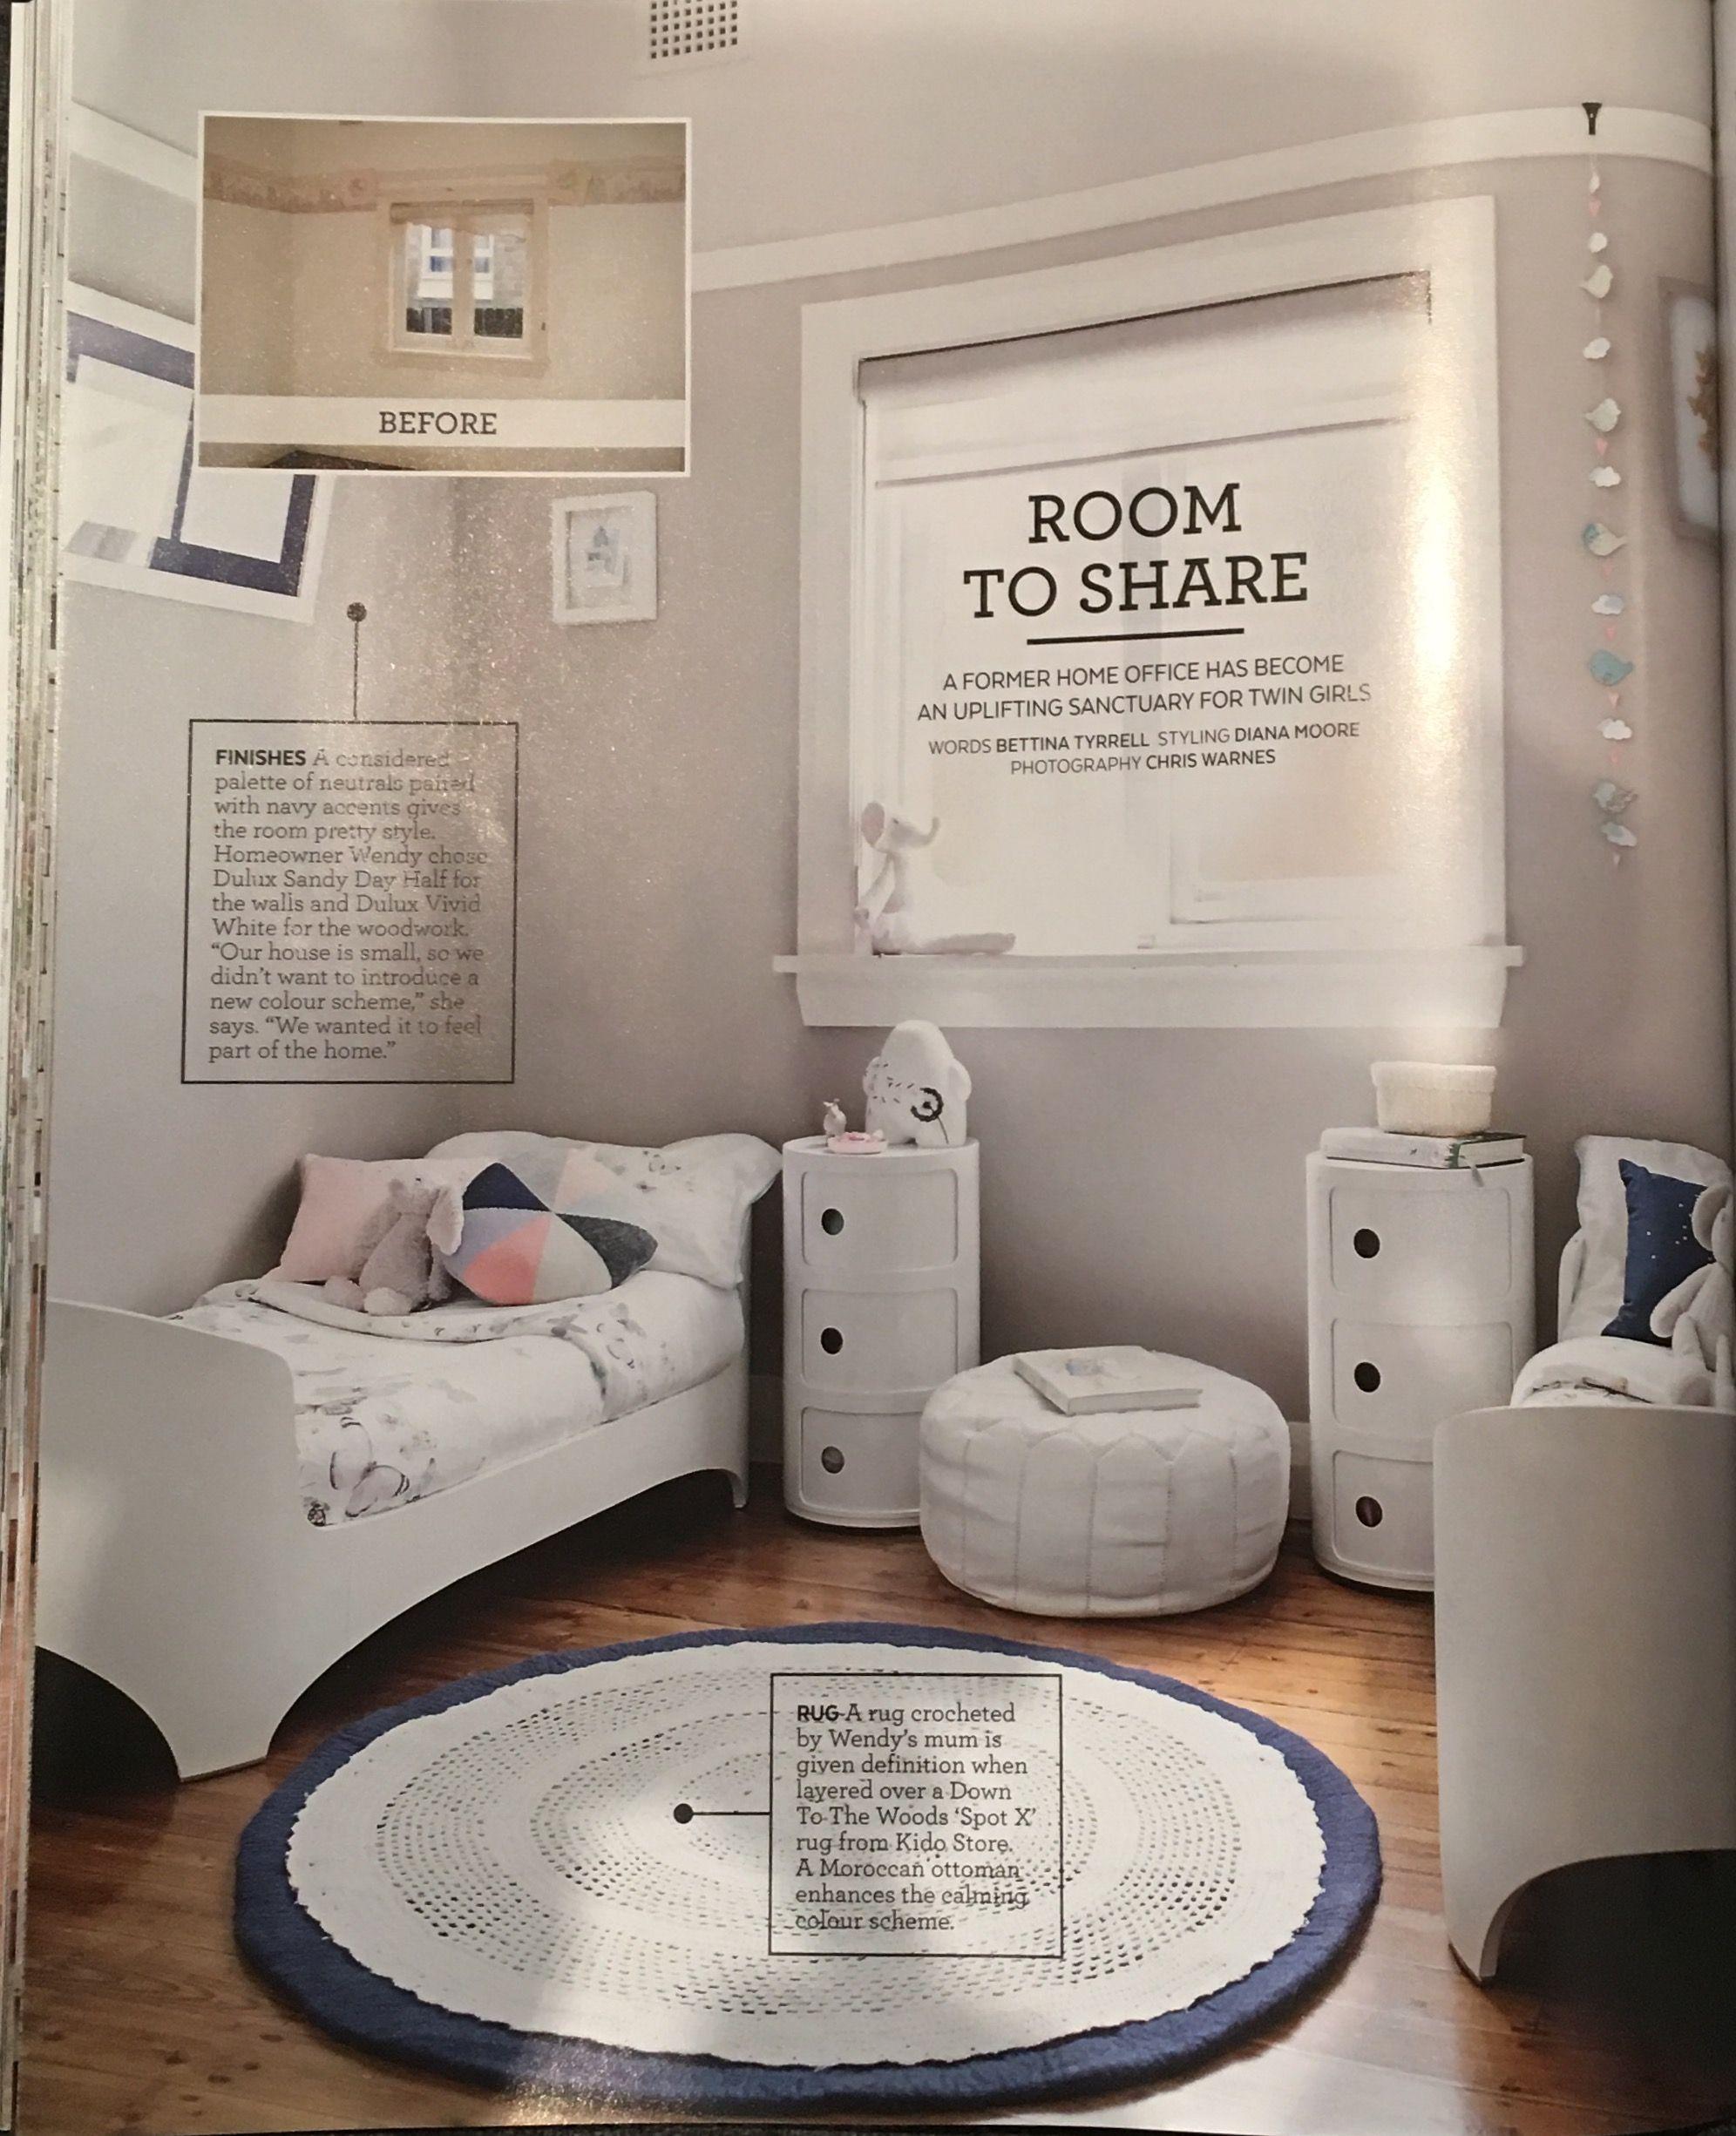 Dulux Vivid White Kitchen: Dulux Sandy Day Half On Walls & Dulux Vivid White For